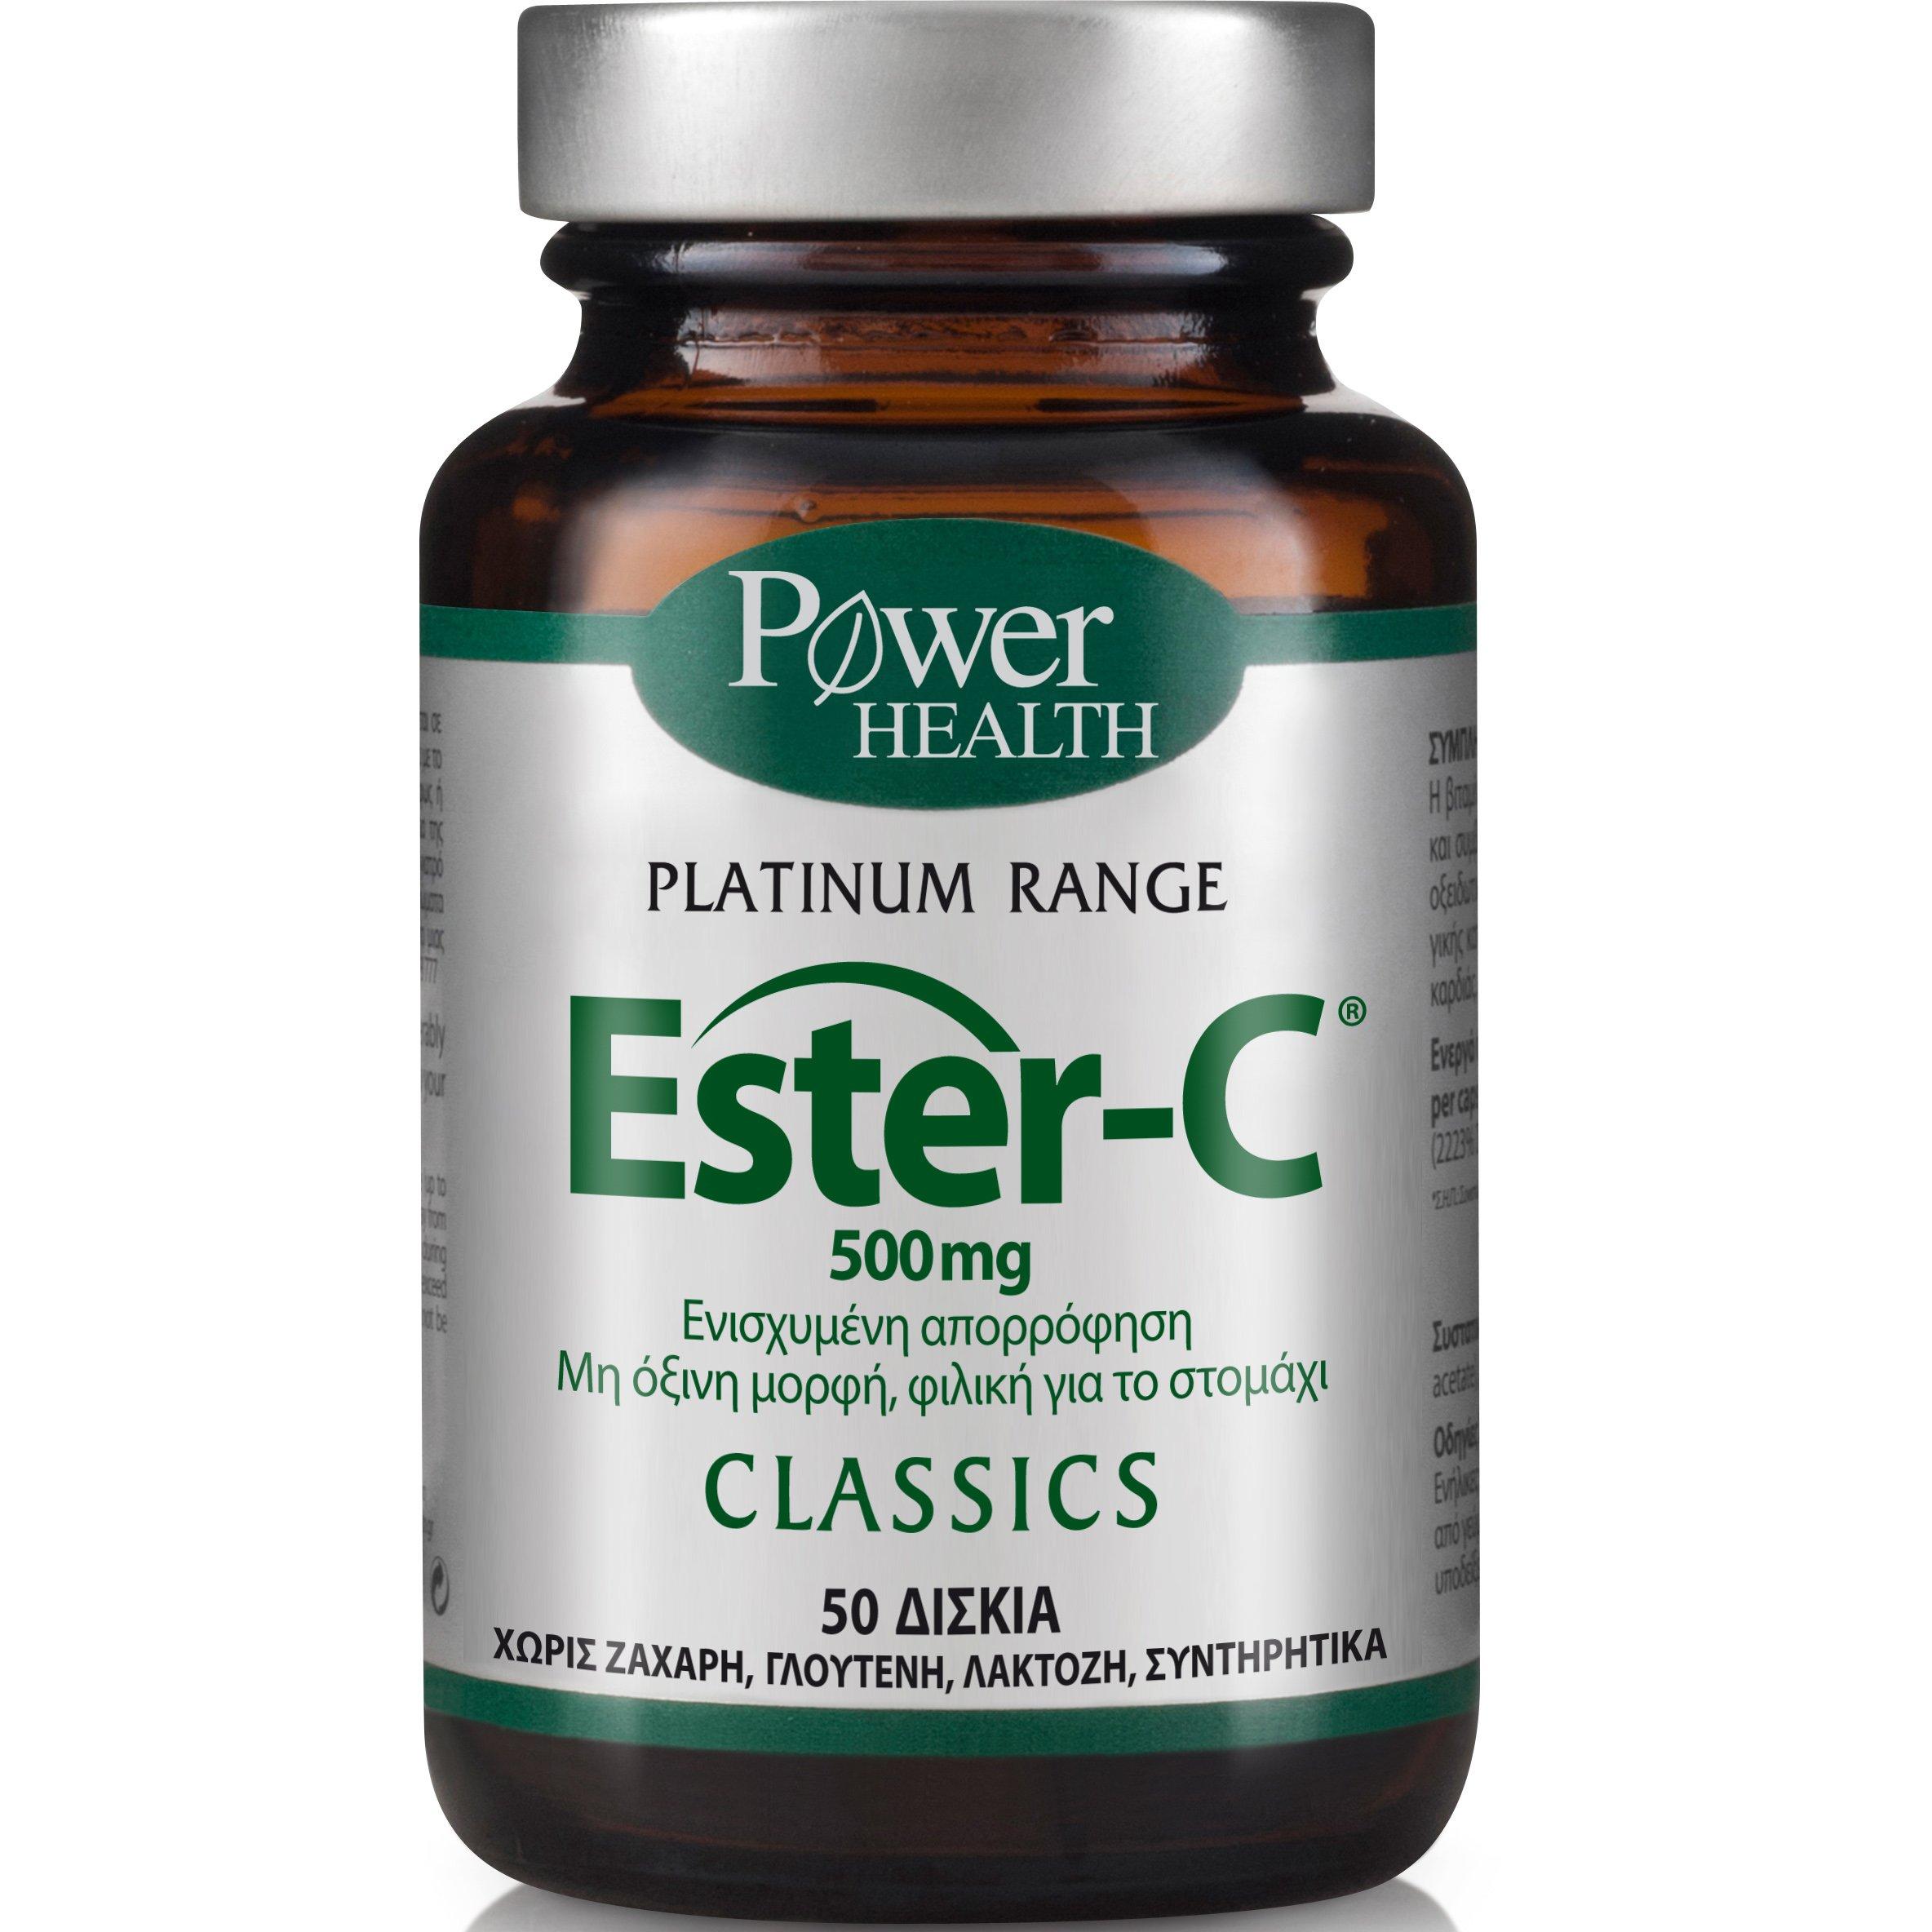 Power Health Platinum Ester-C 500mg Συμπλήρωμα Διατροφής Βιταμίνης C Υψηλής Βιοδιαθεσιμότητας για Υψηλές Απαιτήσεις 50tabs